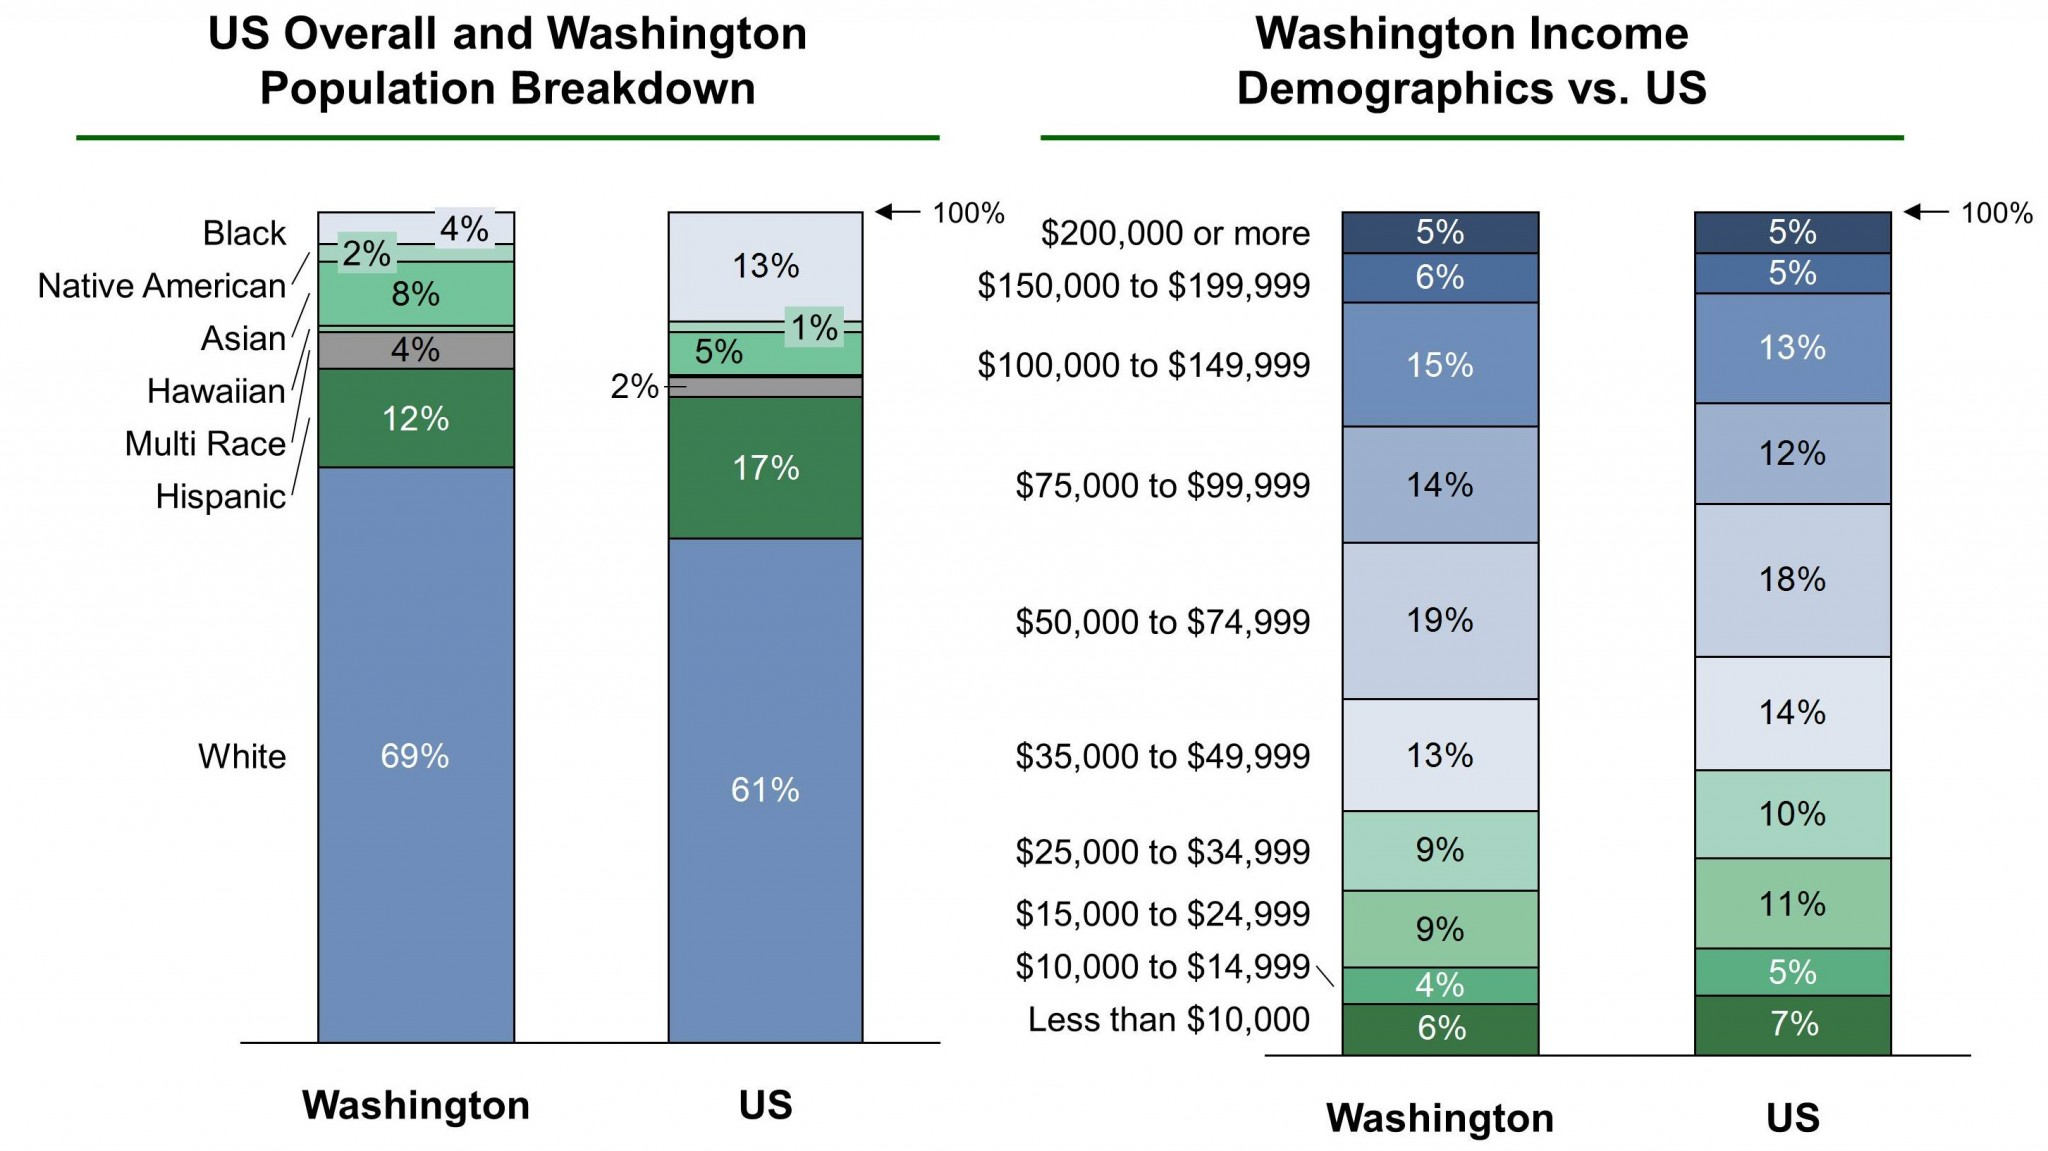 Washington EB-5 Regional Center Demographics VF